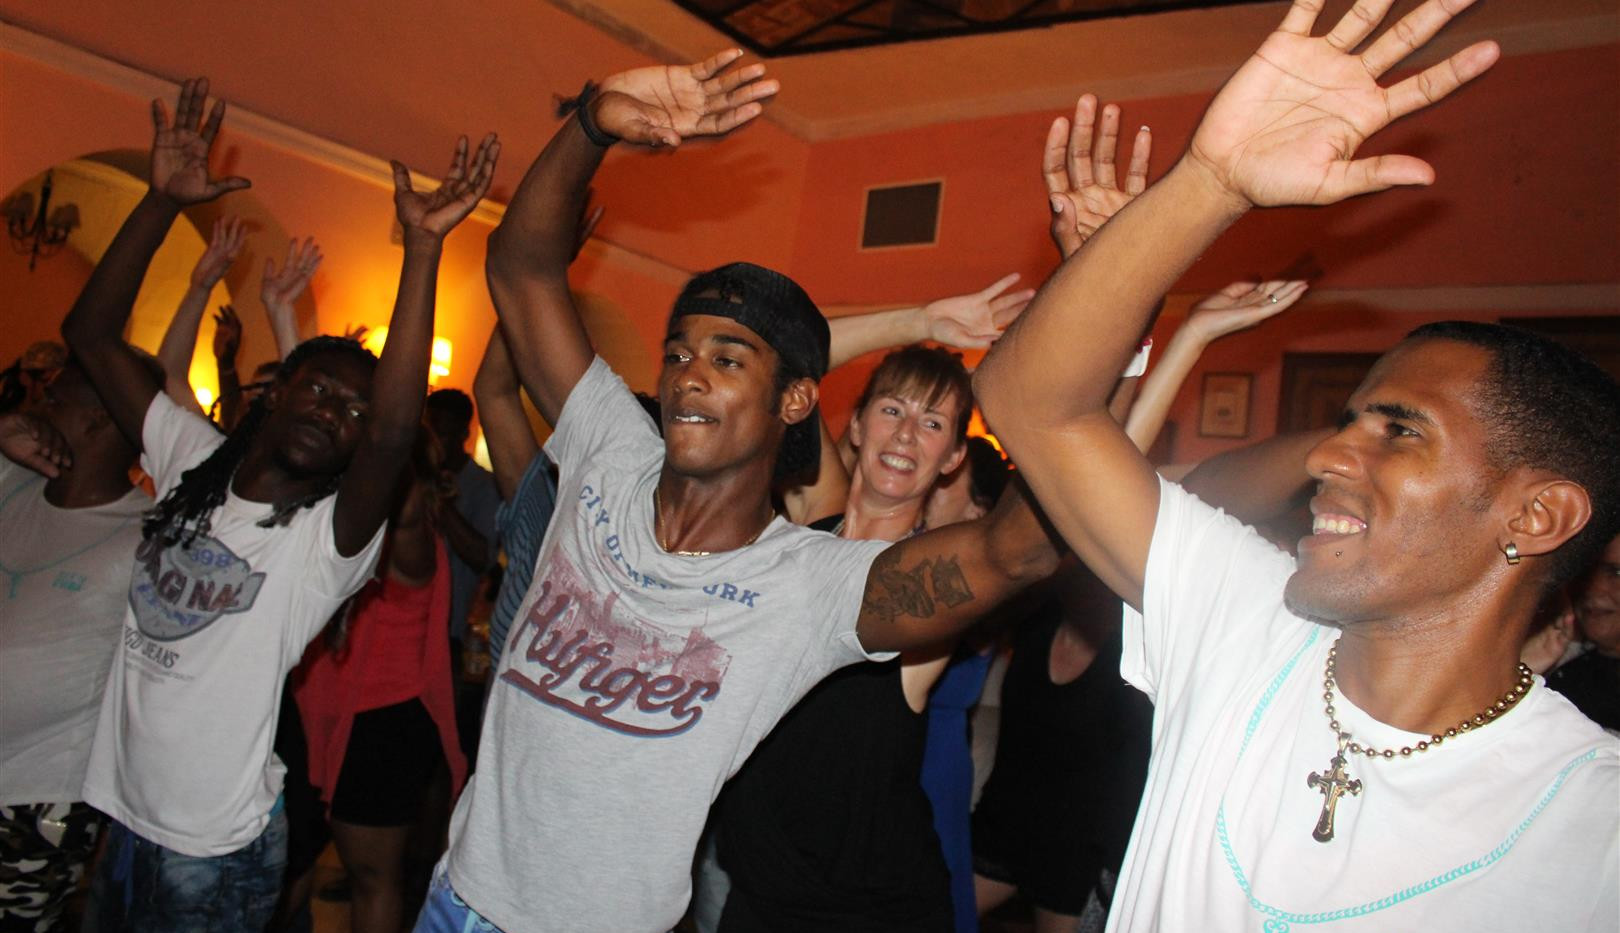 Key2Cuba dancers in club, Havana, Cuba